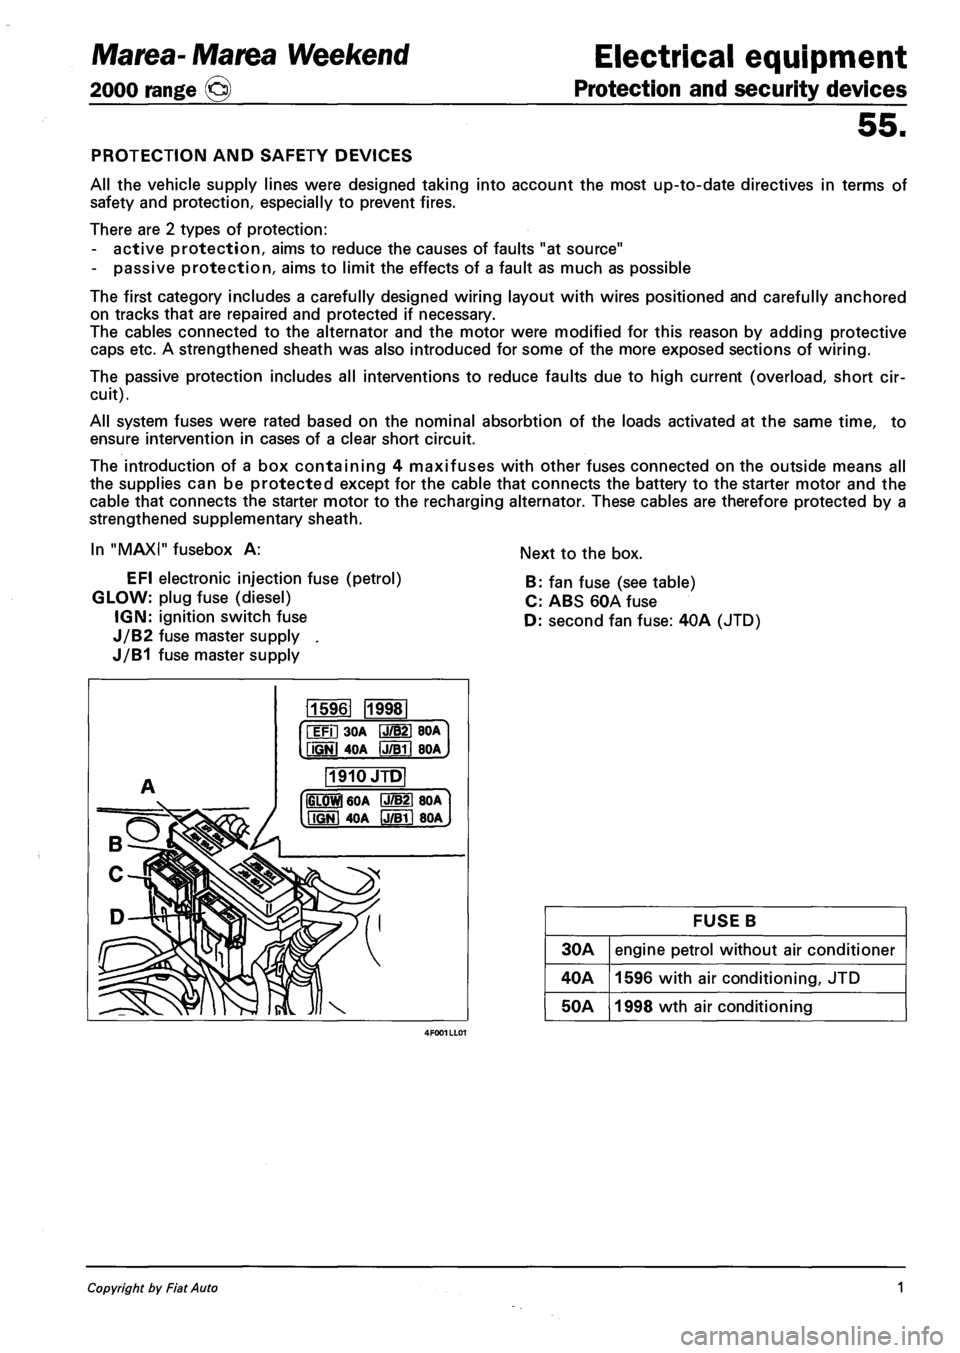 Fuses Fiat Marea 2001 1g Workshop Manual Idea Fuse Box Page 131